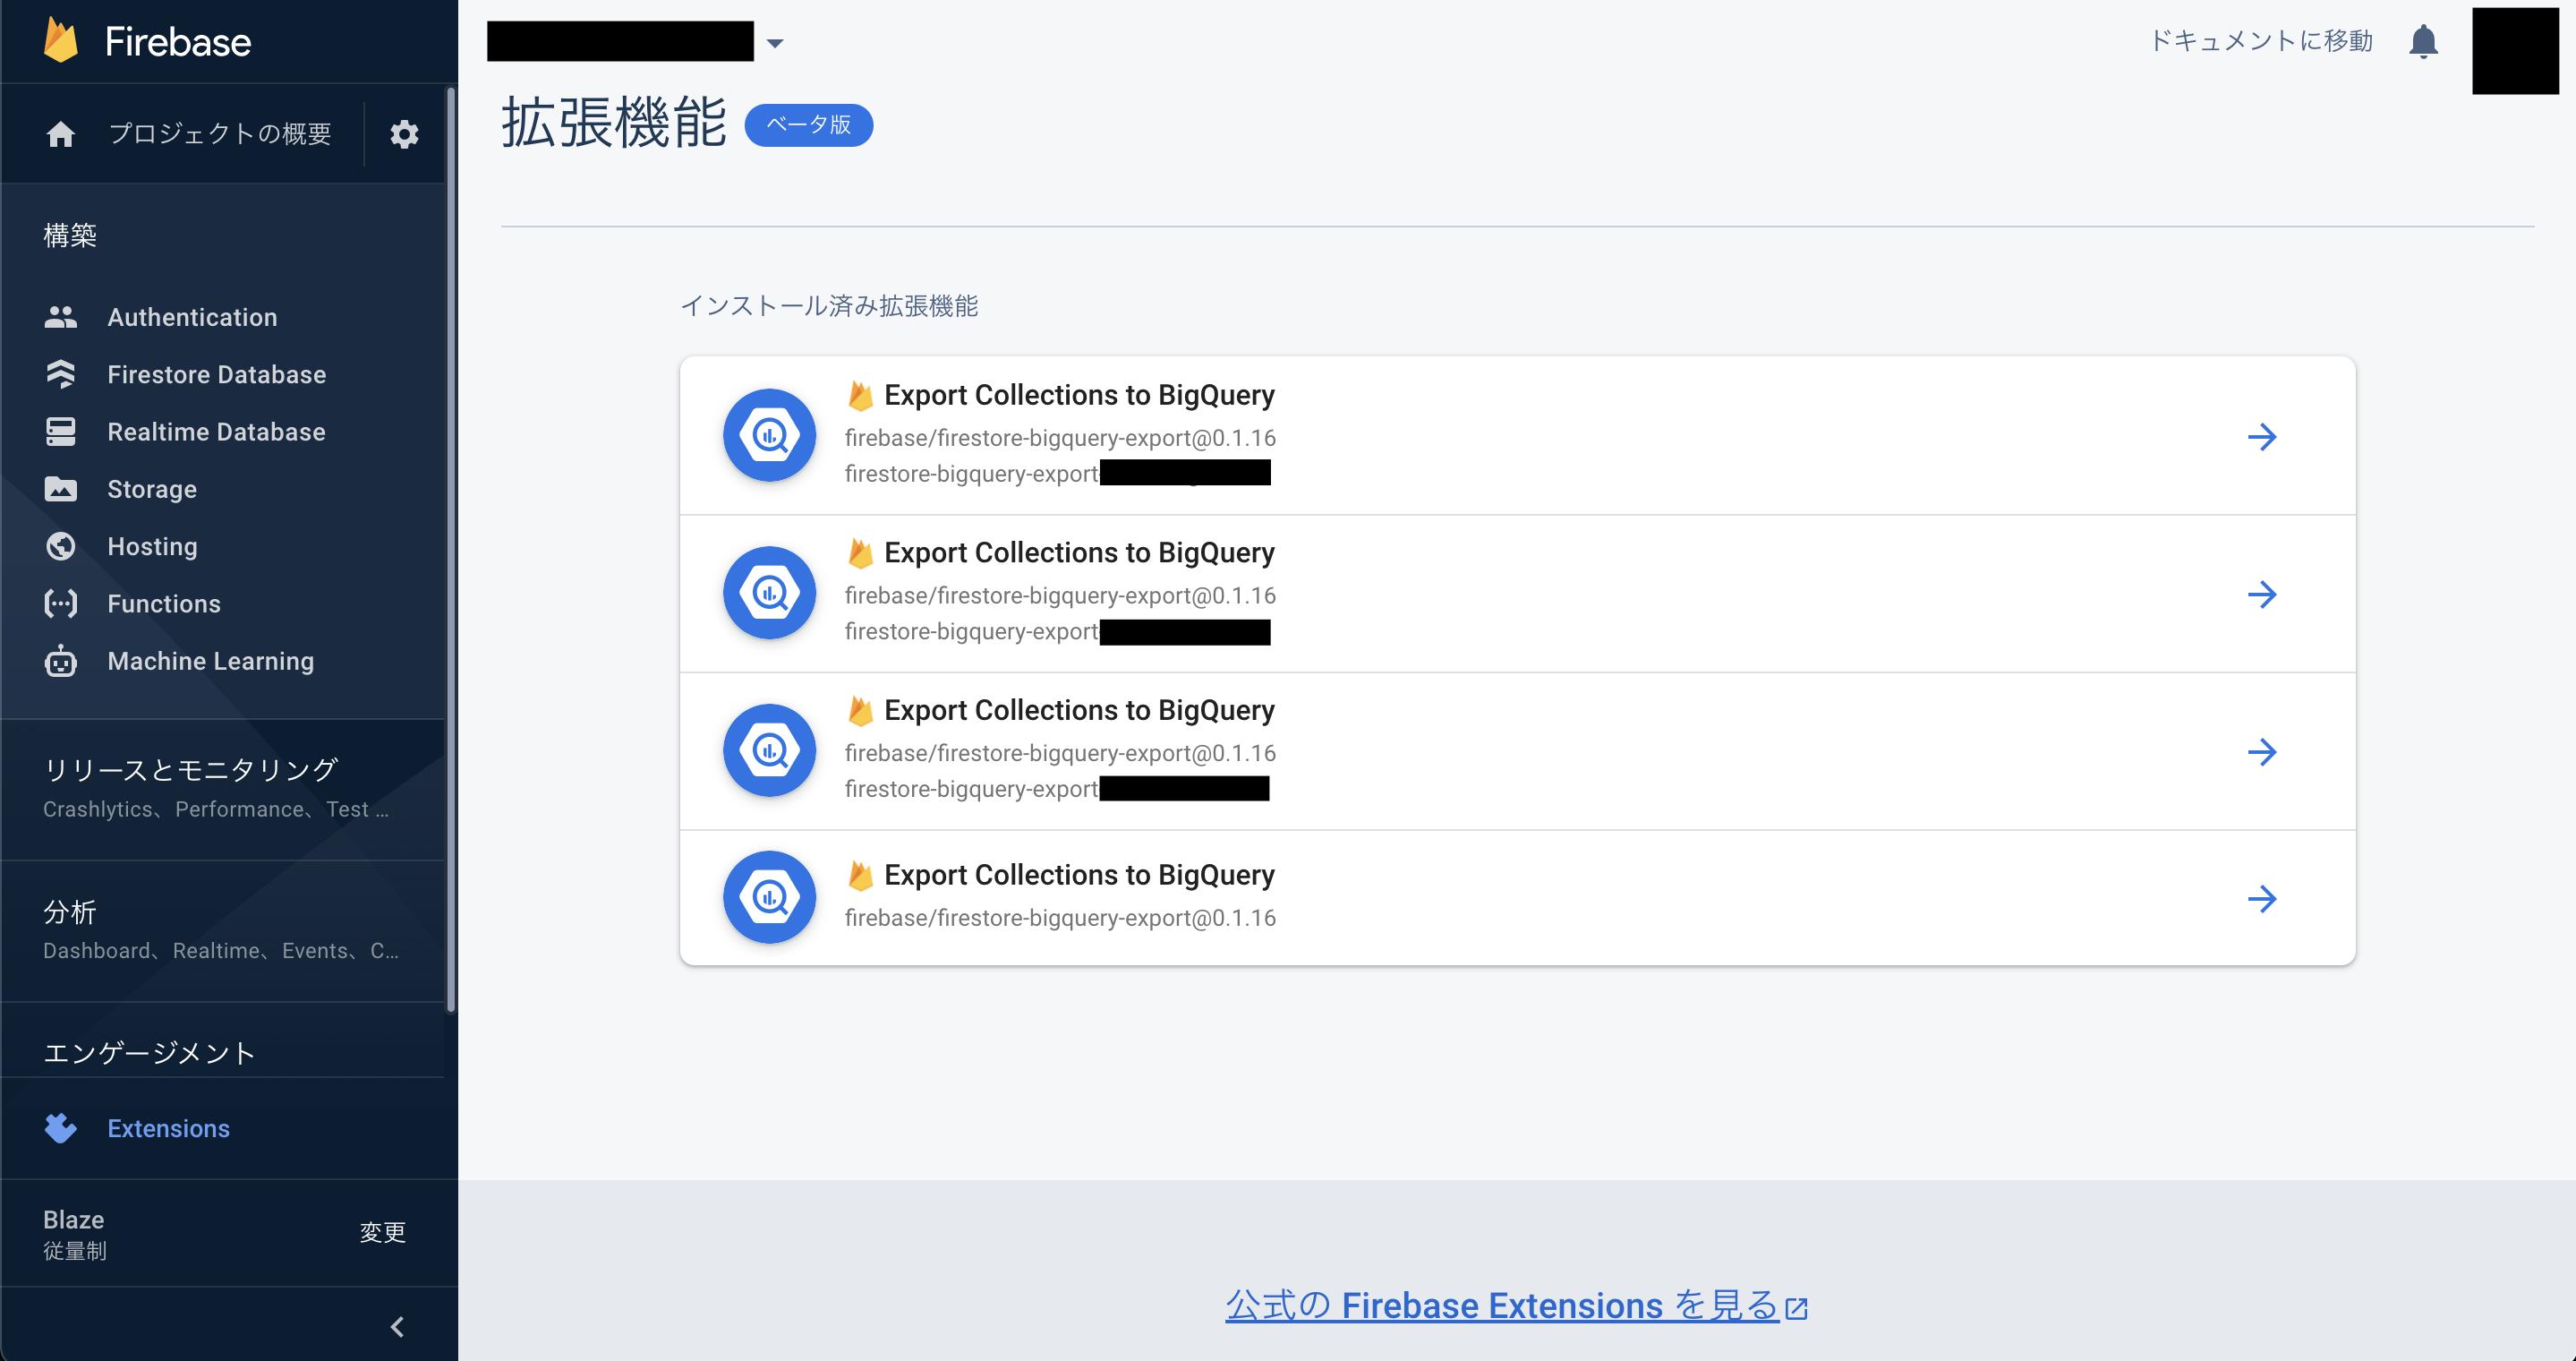 Firebase Extensions